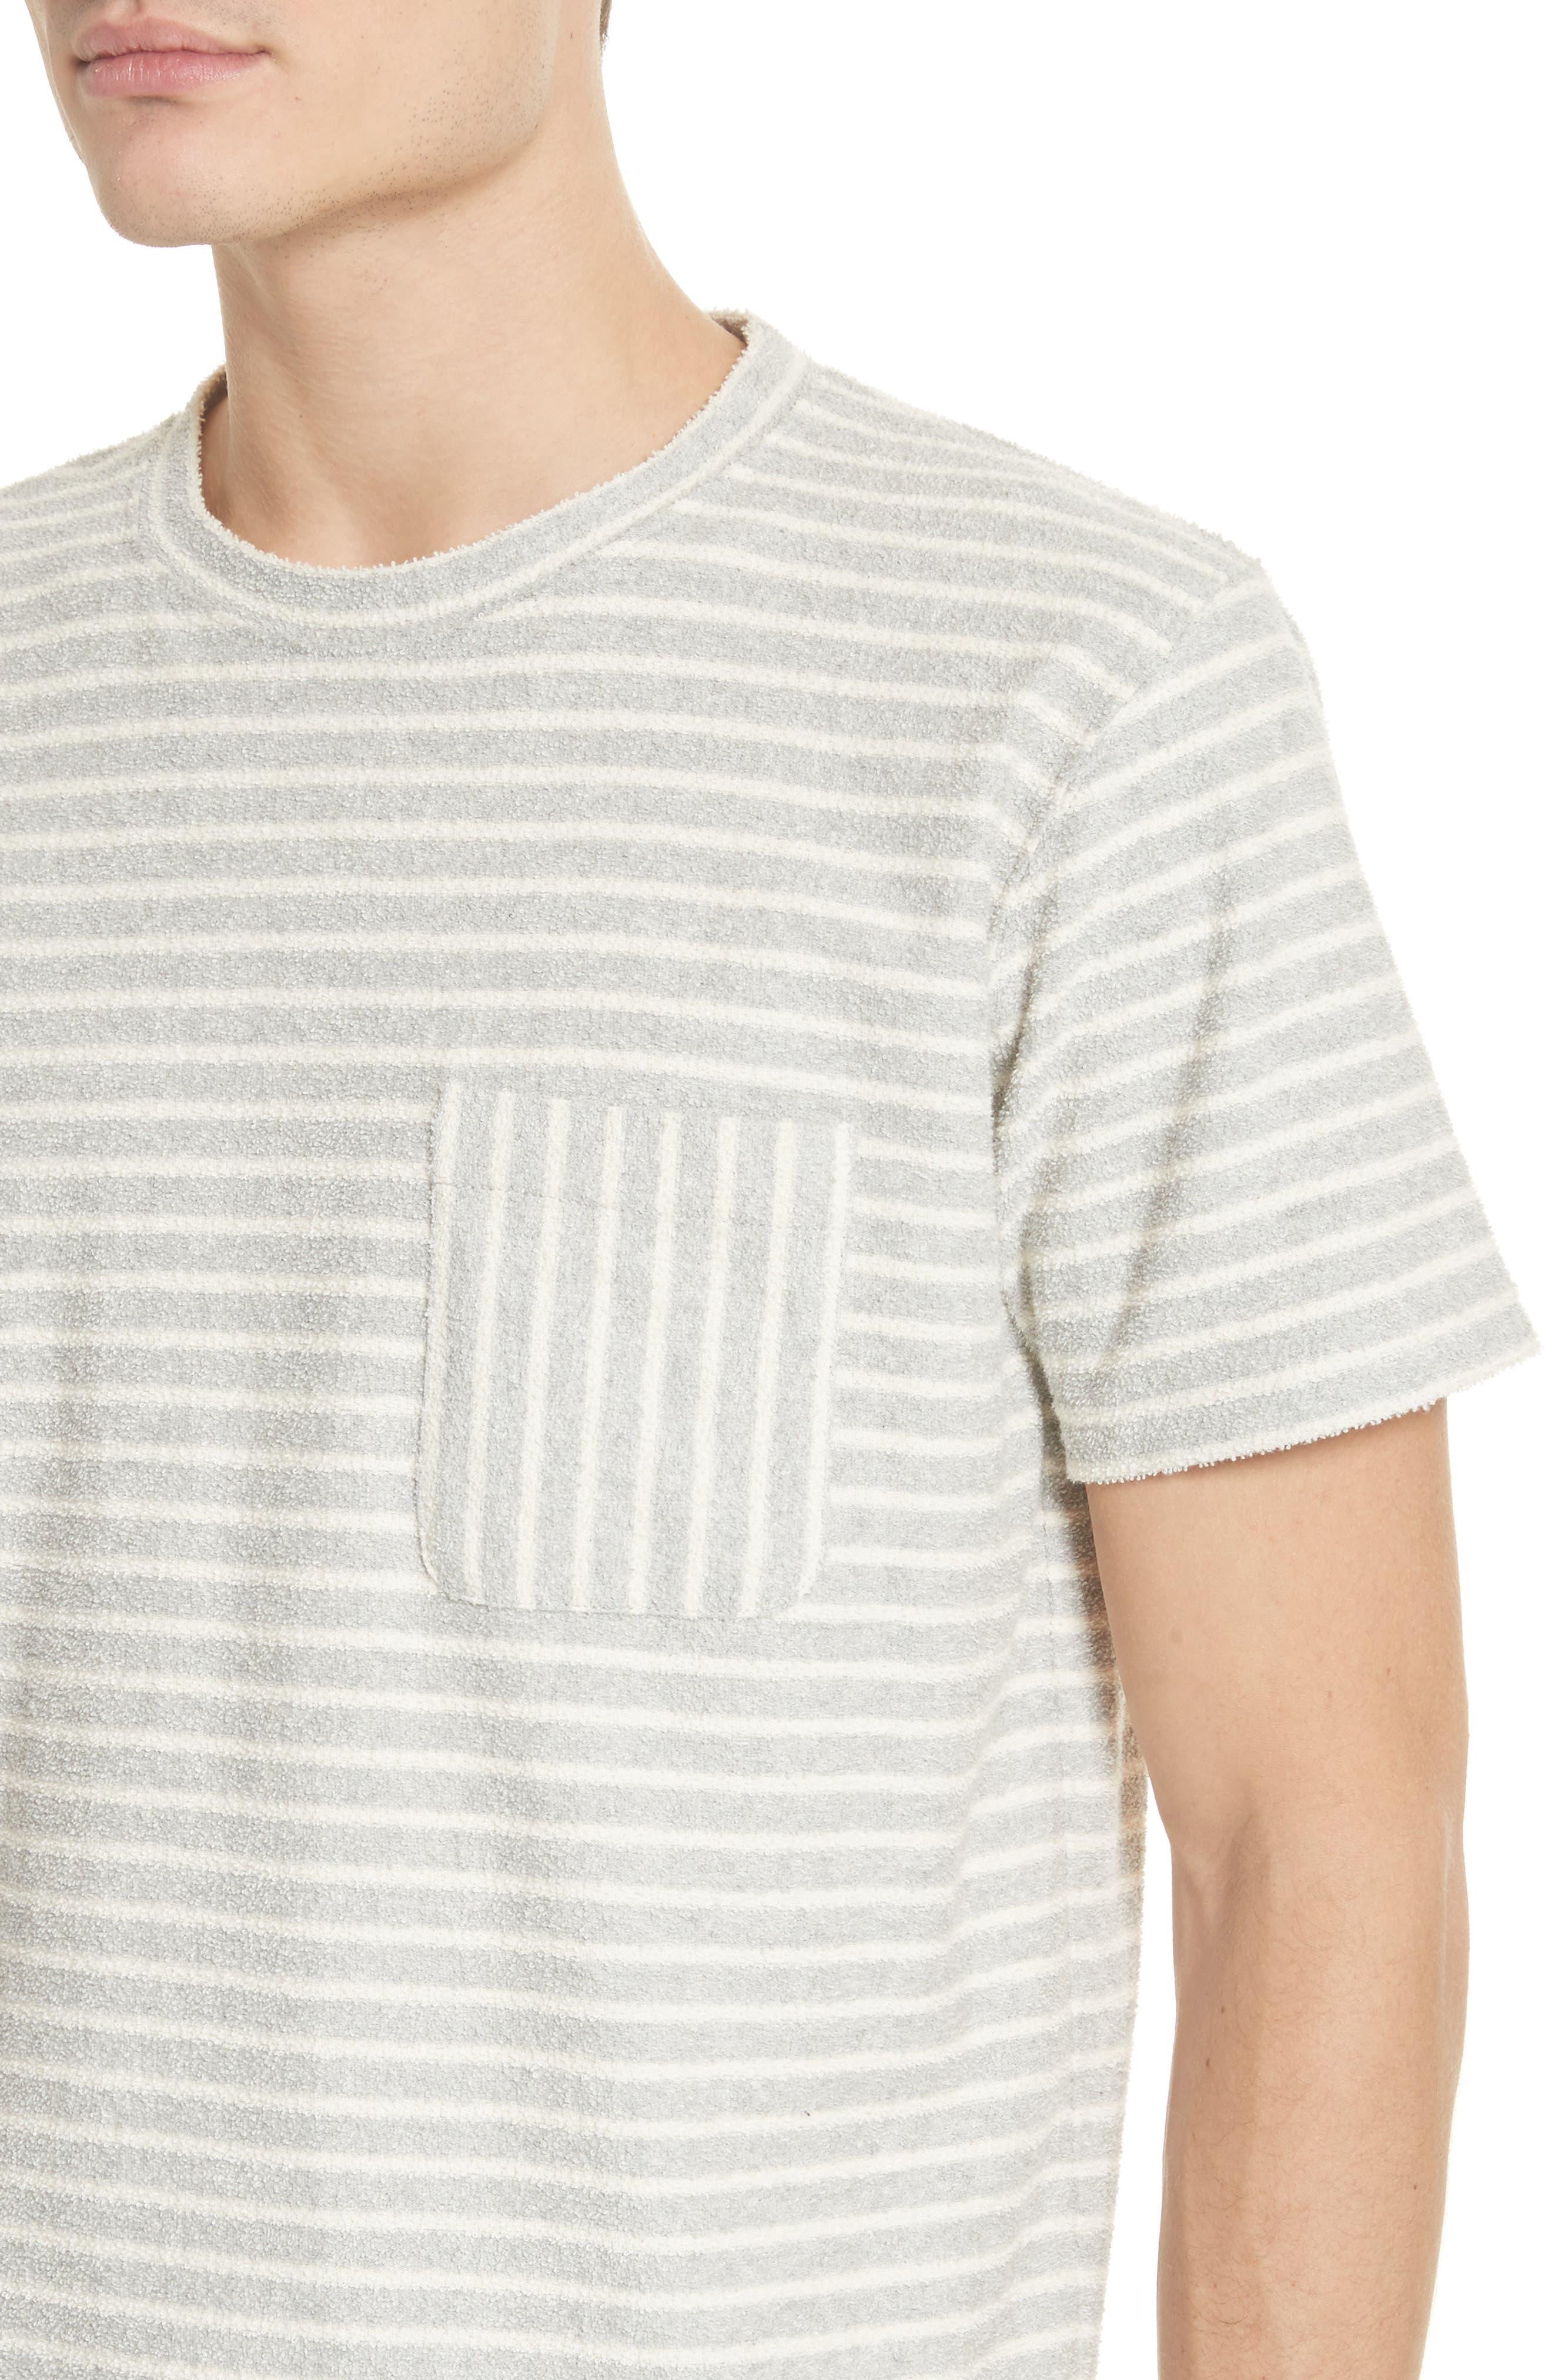 Niels Stripe Pocket T-Shirt,                             Alternate thumbnail 4, color,                             050